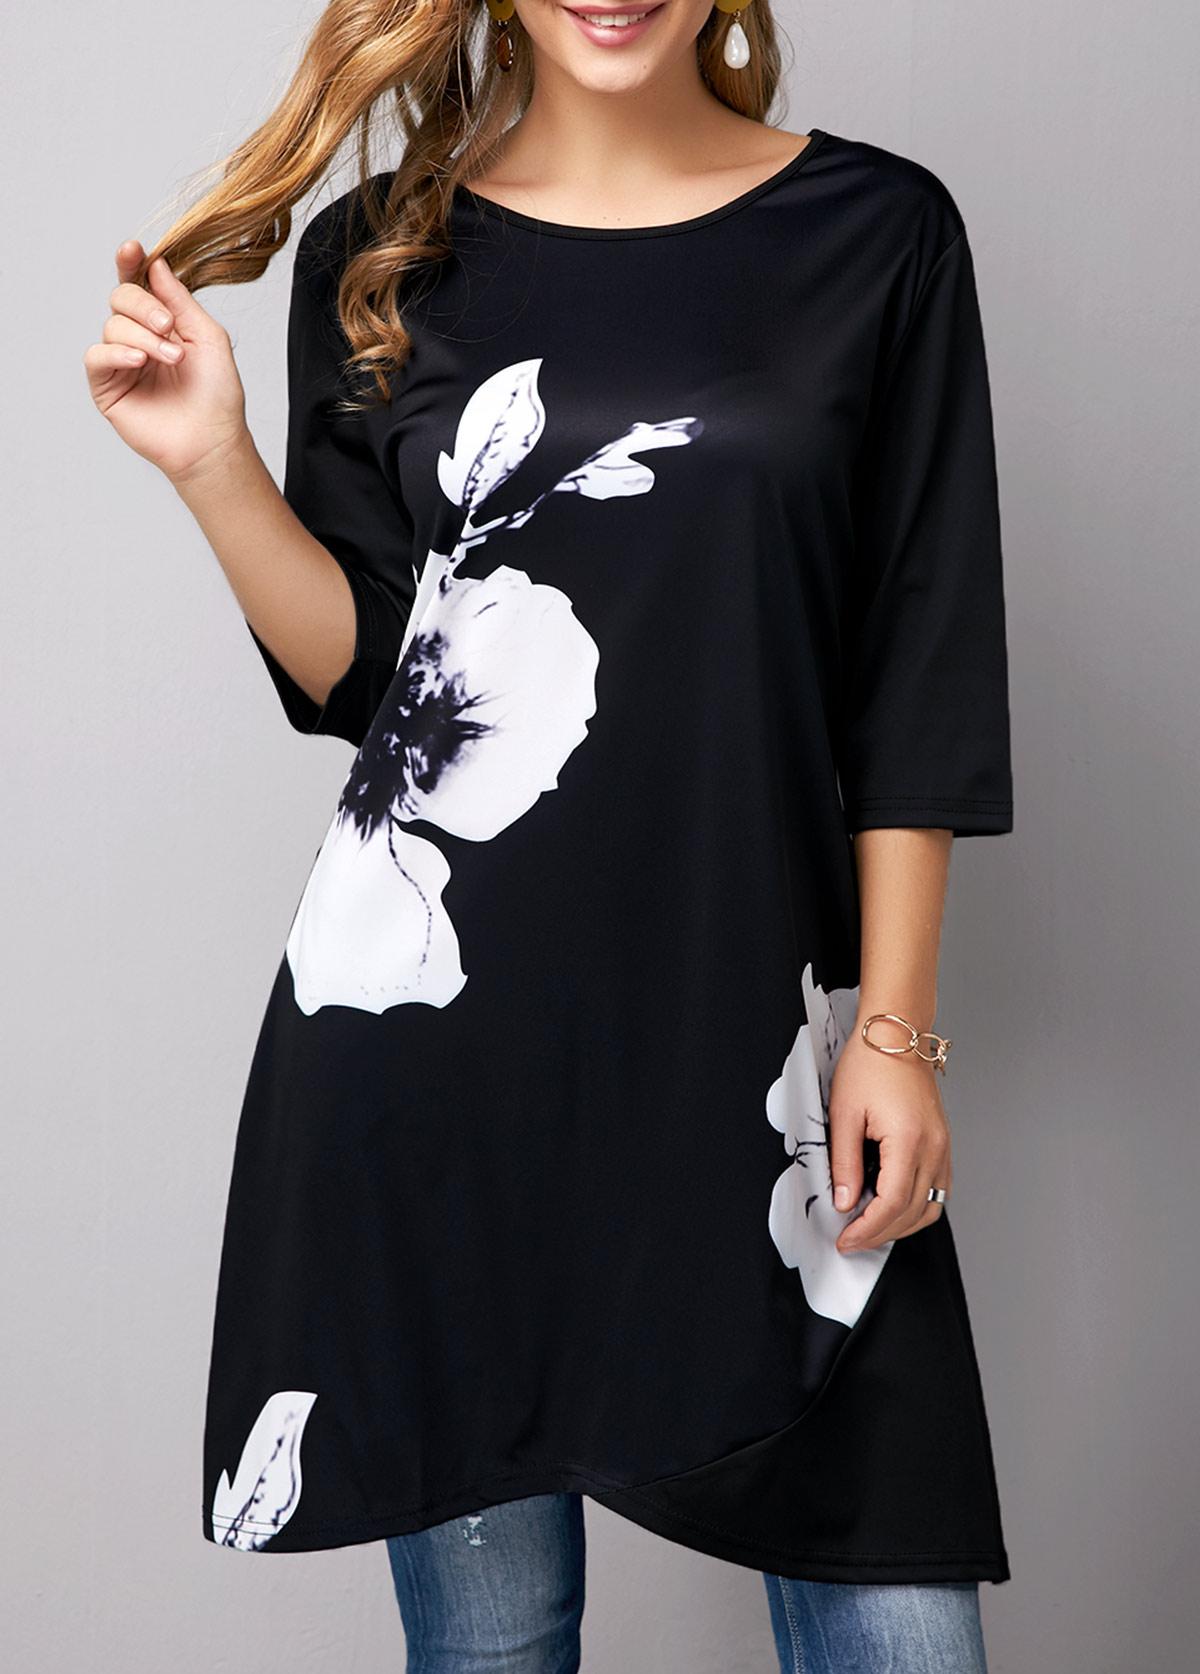 Crossover Hem Flower Print Black T Shirt